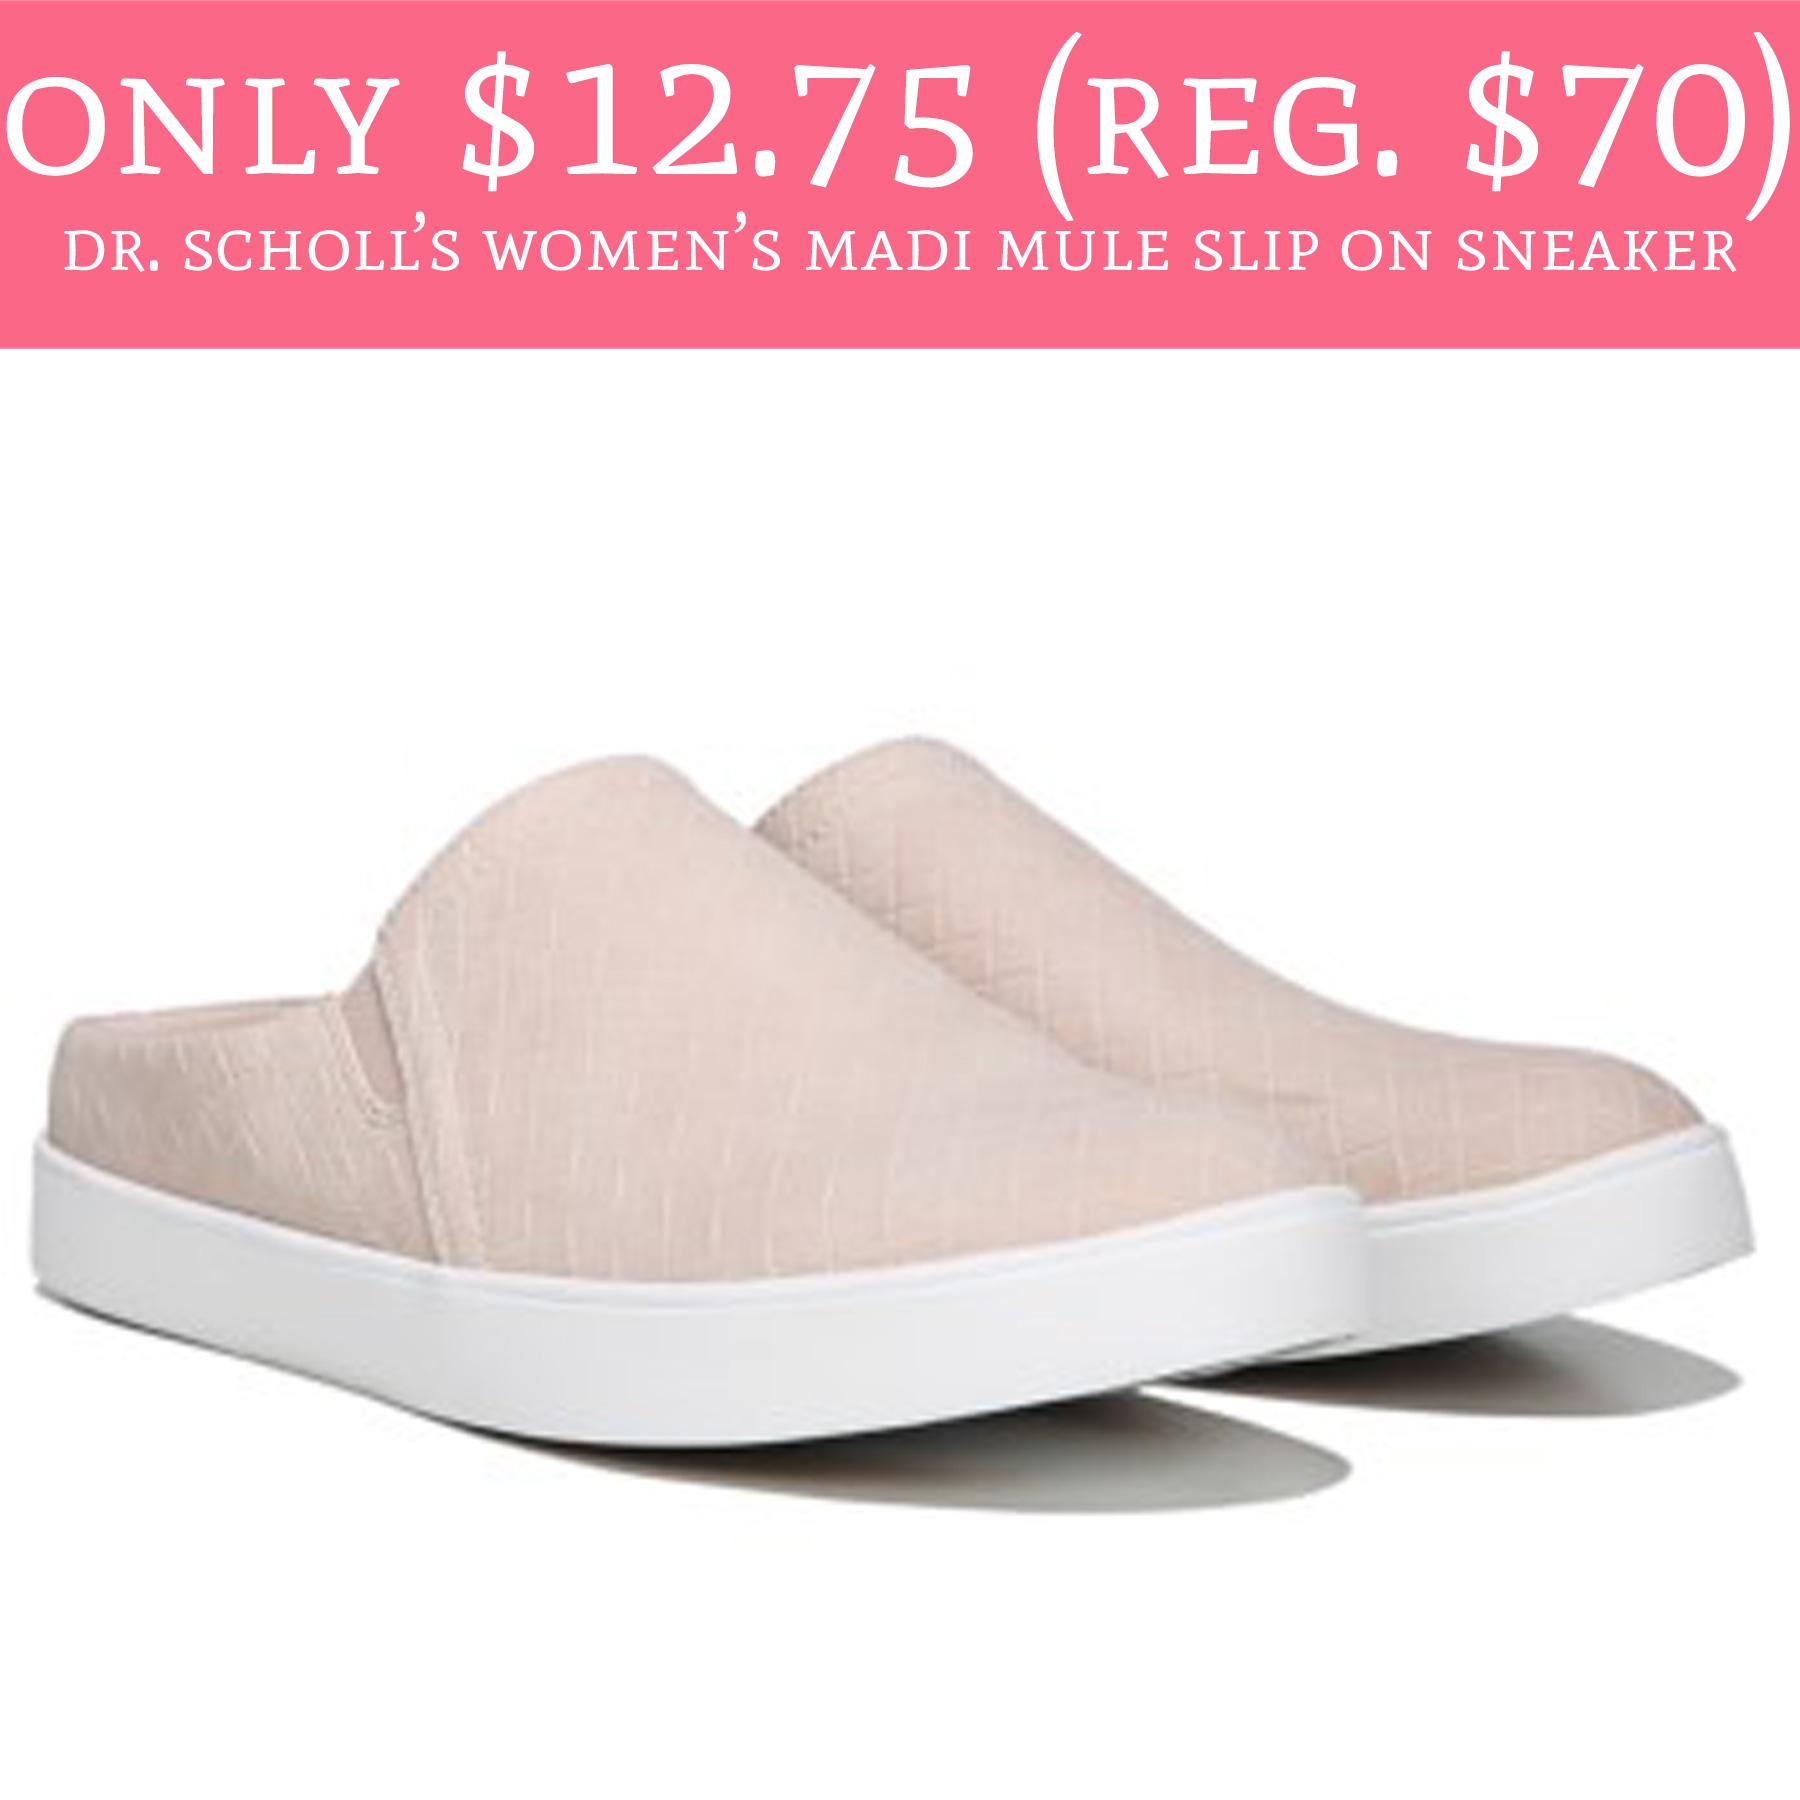 4f68edcbed06f Only $12.75 (Reg. $70) Dr. Scholl's Women's Madi Mule Slip On ...